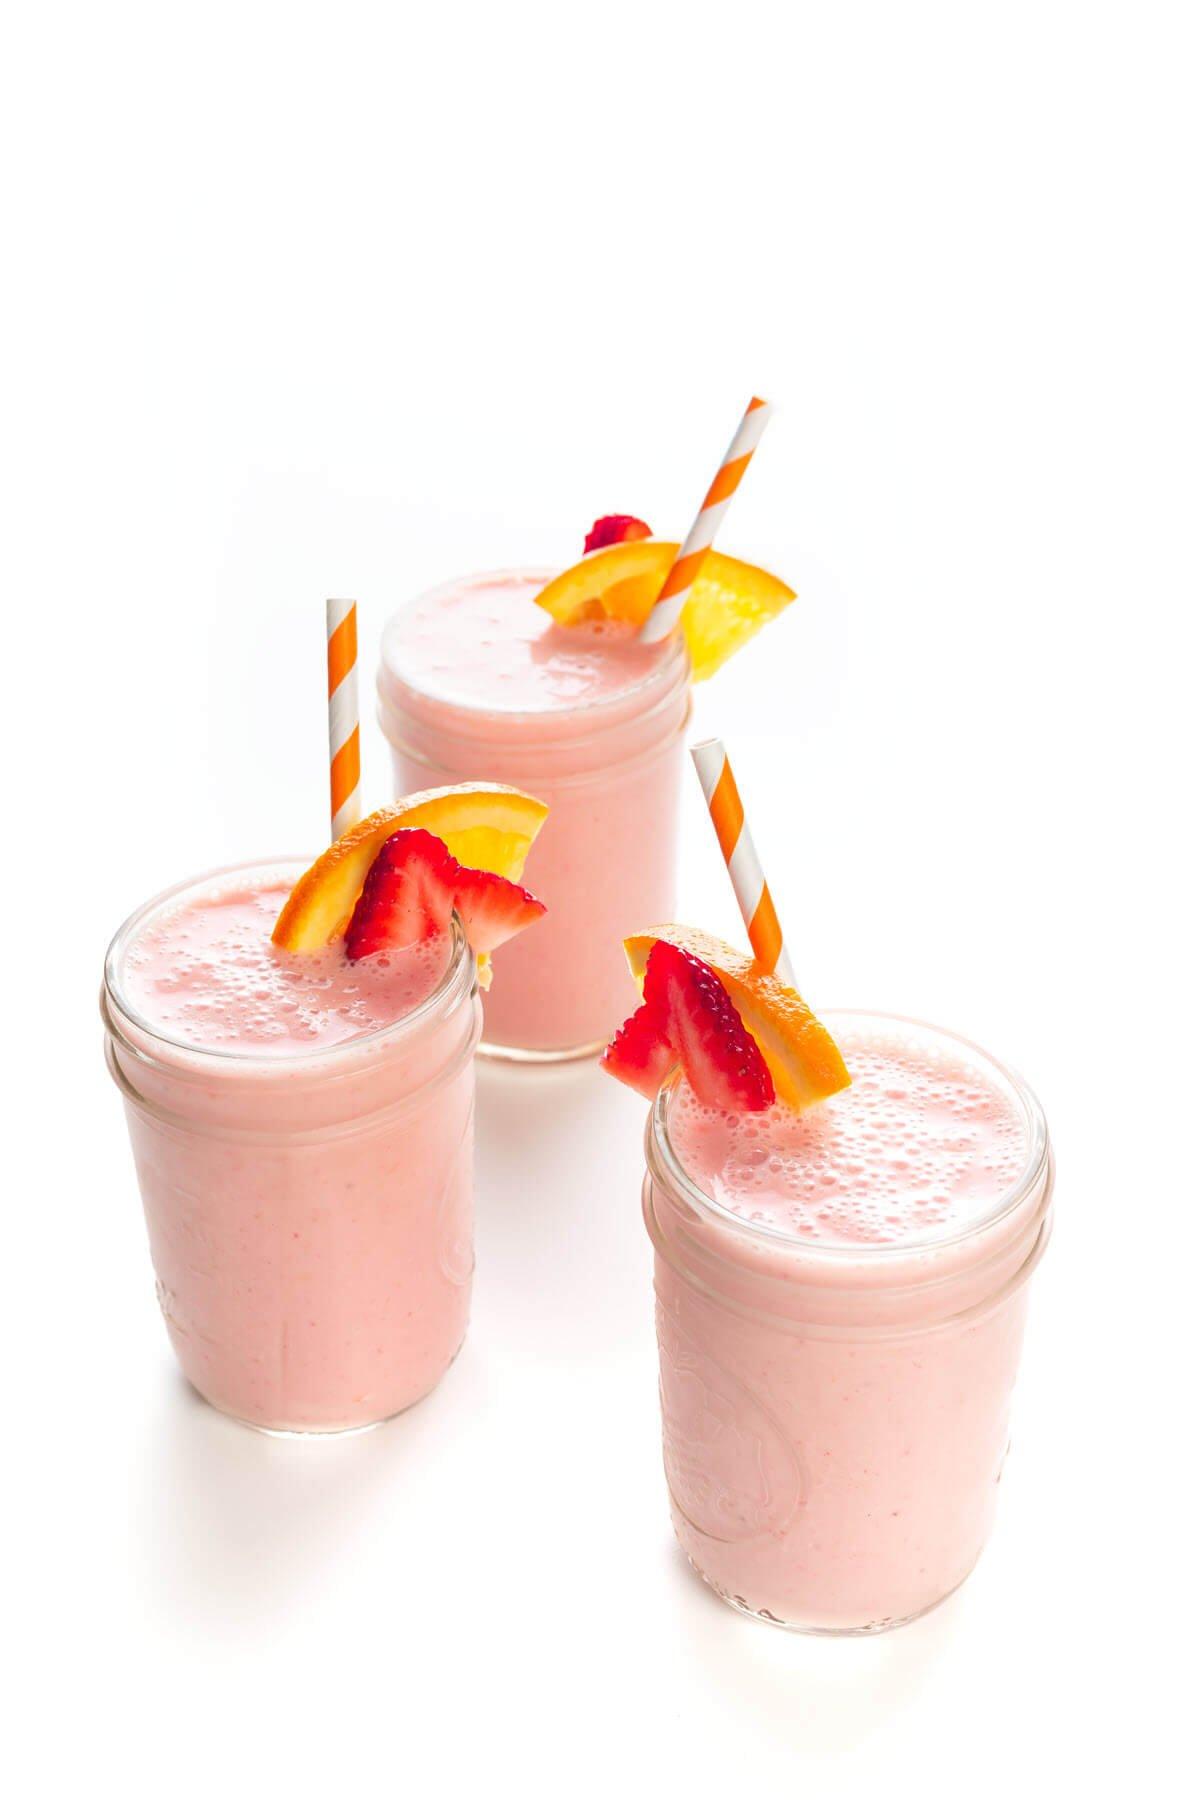 3 Strawberry Sunrise Breakfast Smoothies